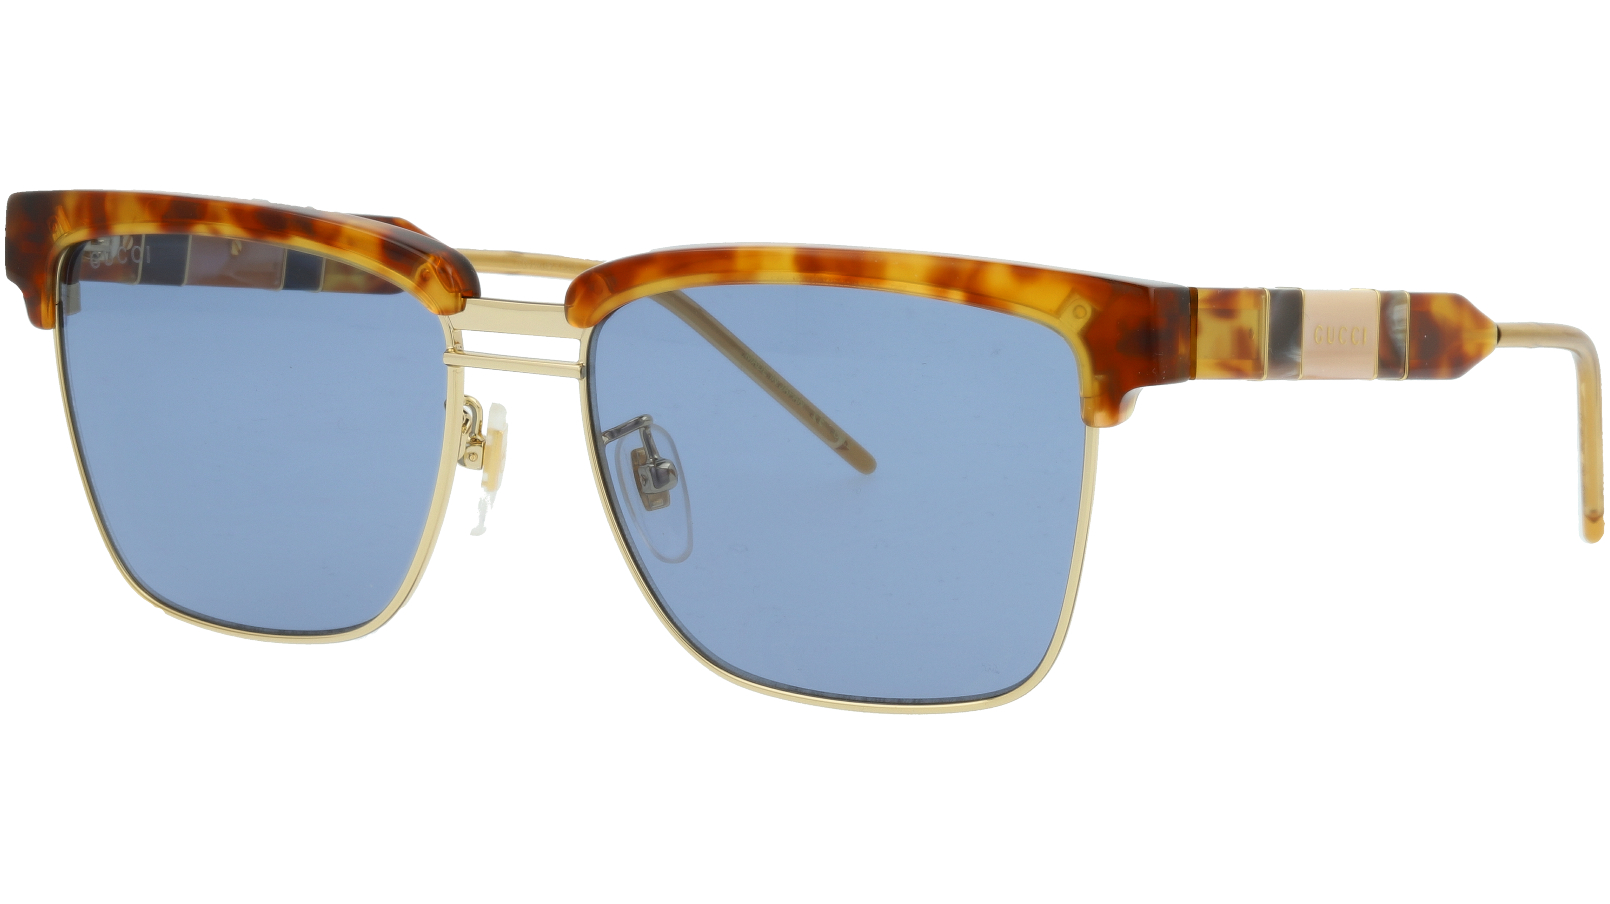 GUCCI GG0603S 005 56 HAVANA Sunglasses